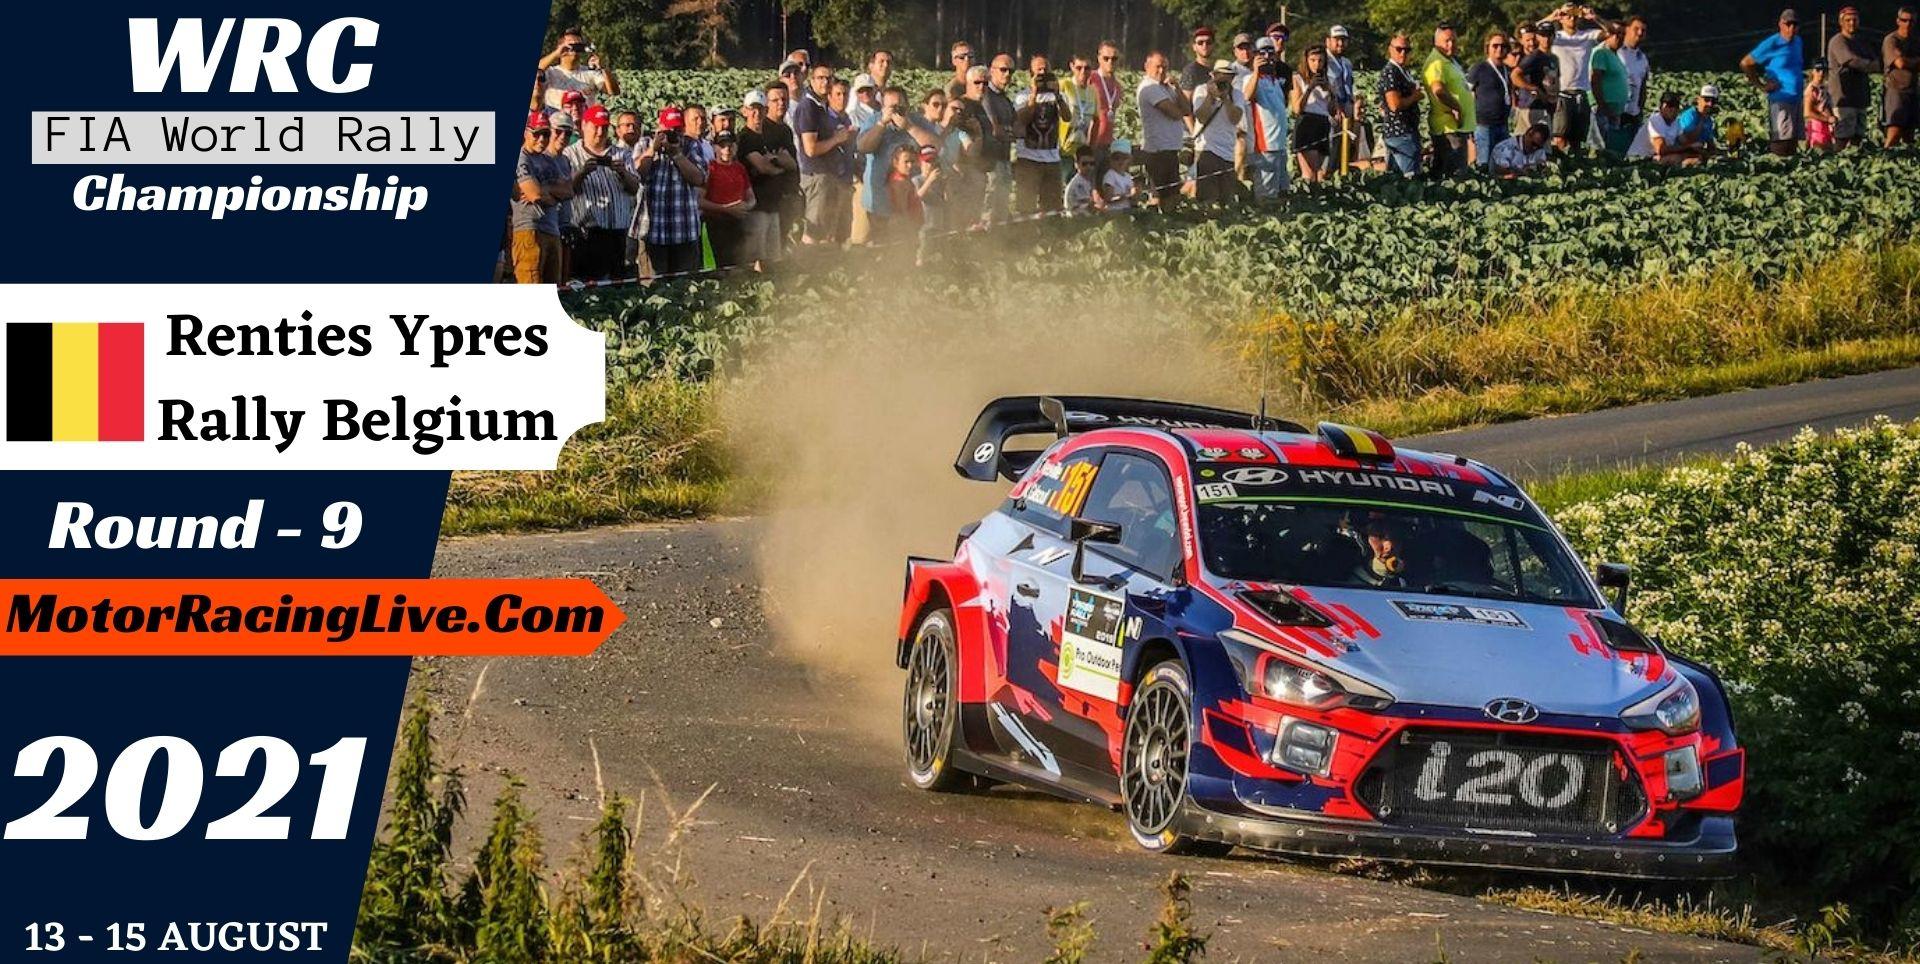 WRC COPEC Rally Chile Round 10 Live Stream 2021